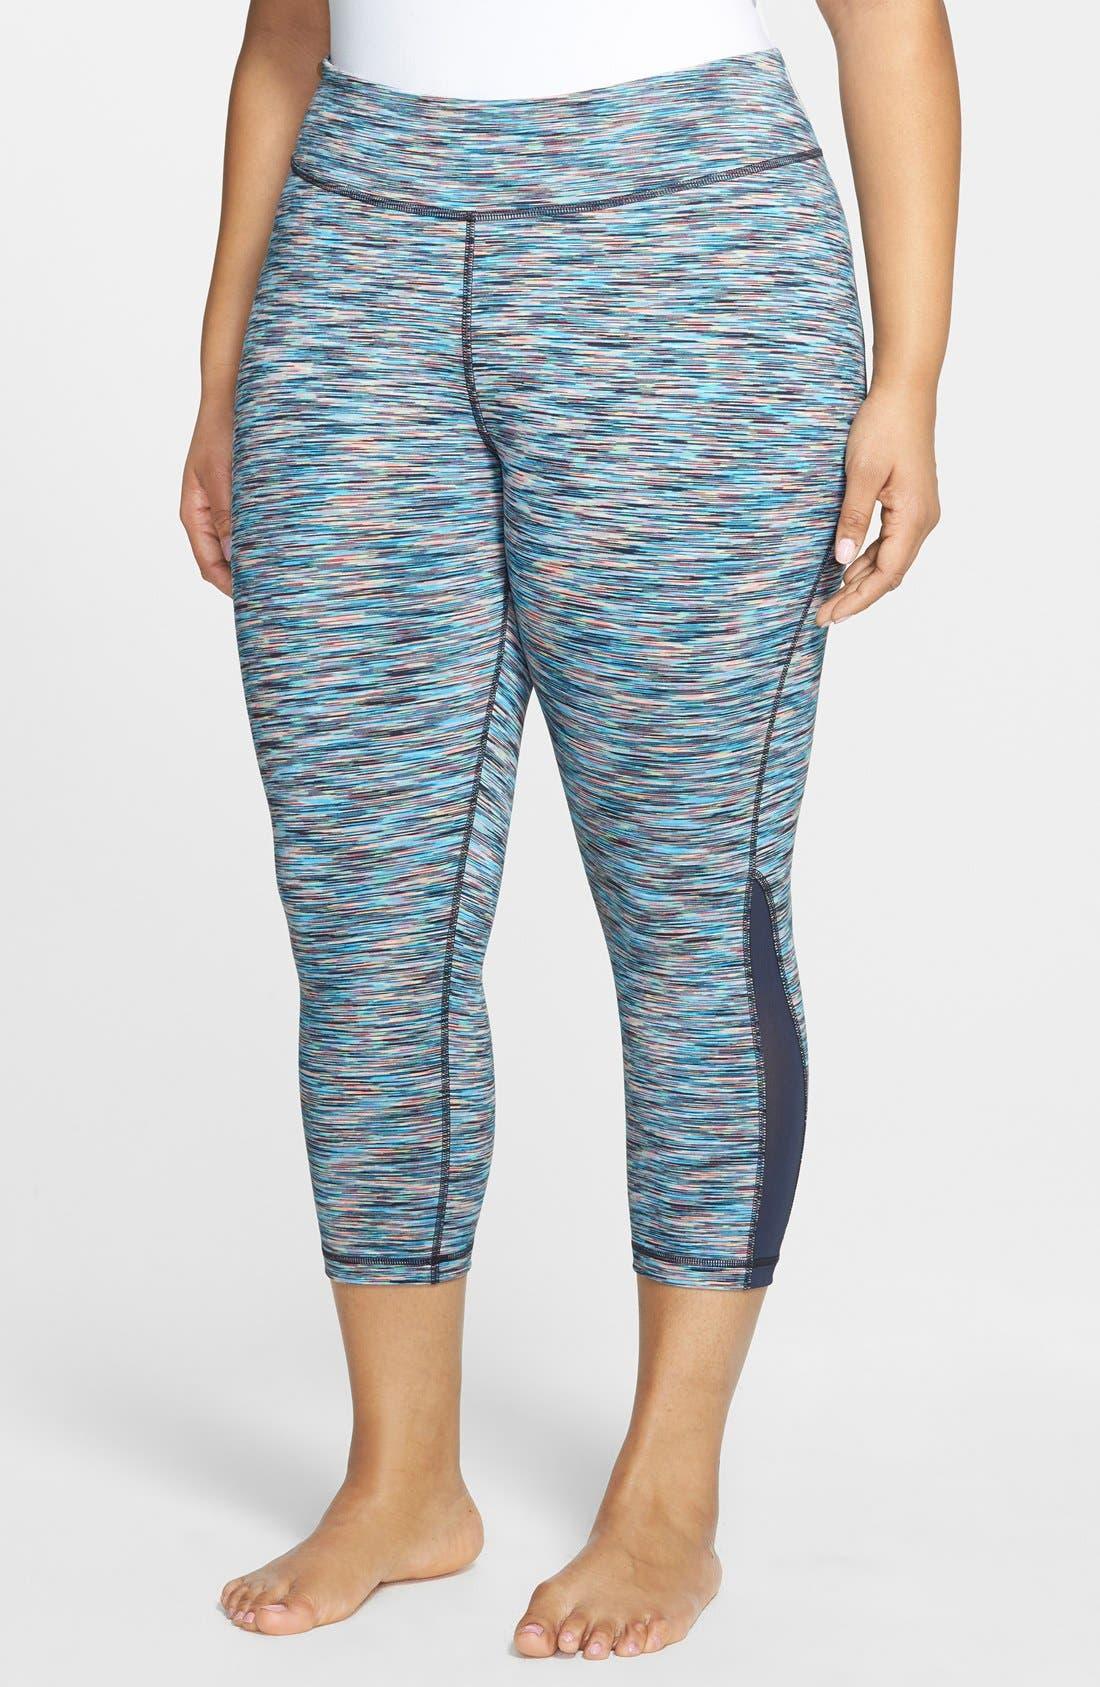 Alternate Image 1 Selected - Zella 'Streamline' Slim Fit Capri Leggings (Plus Size)